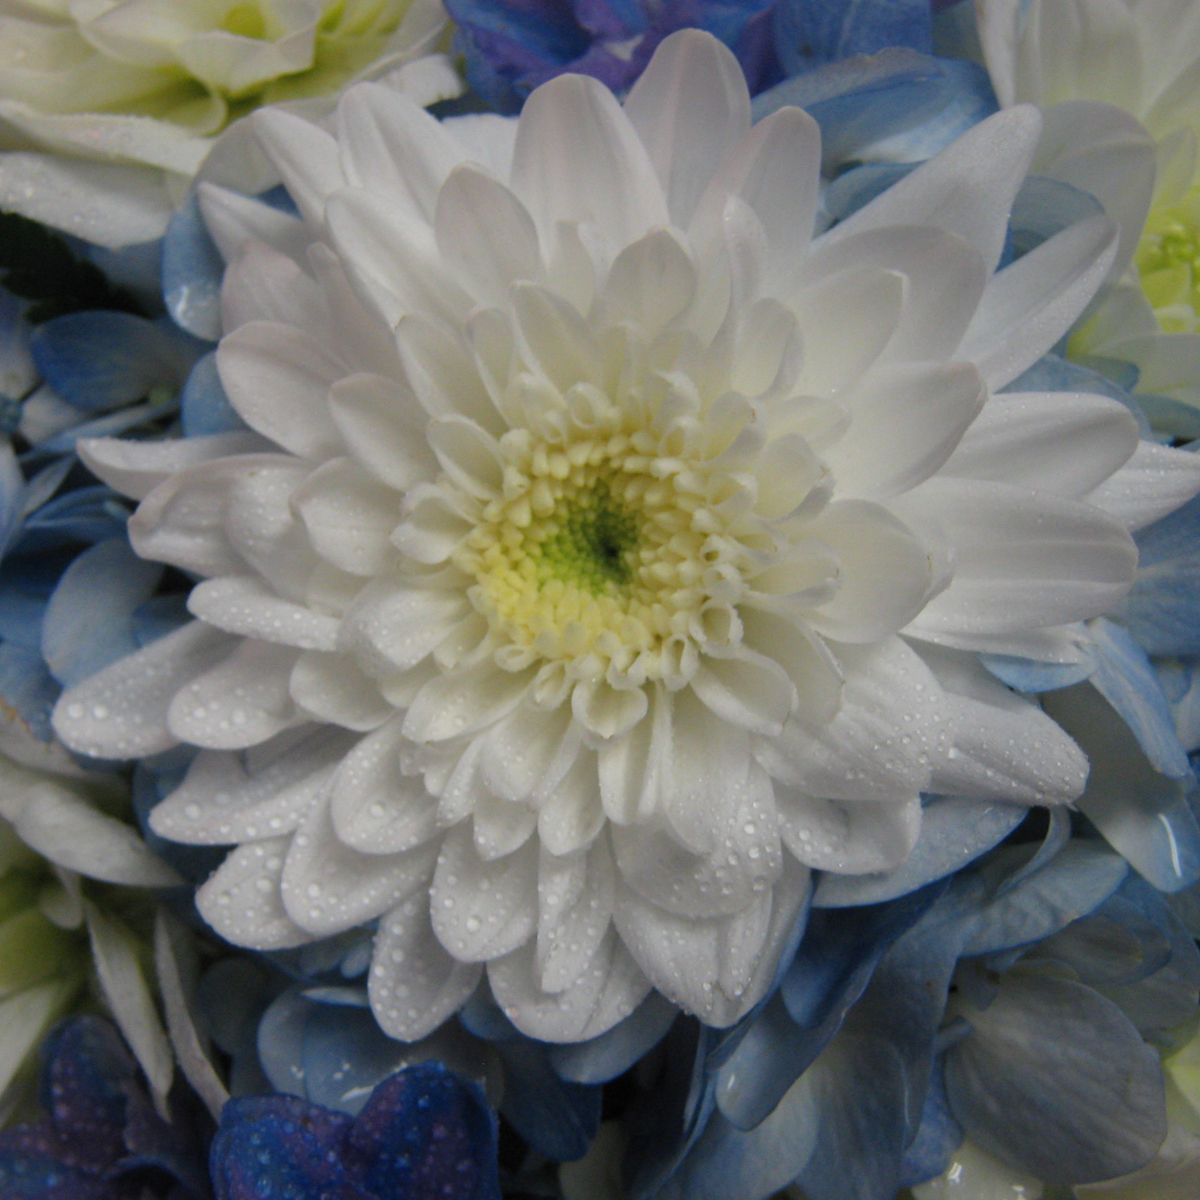 Fall Daisy Wallpaper Button Mums Buffalo Wedding Amp Event Flowers By Lipinoga